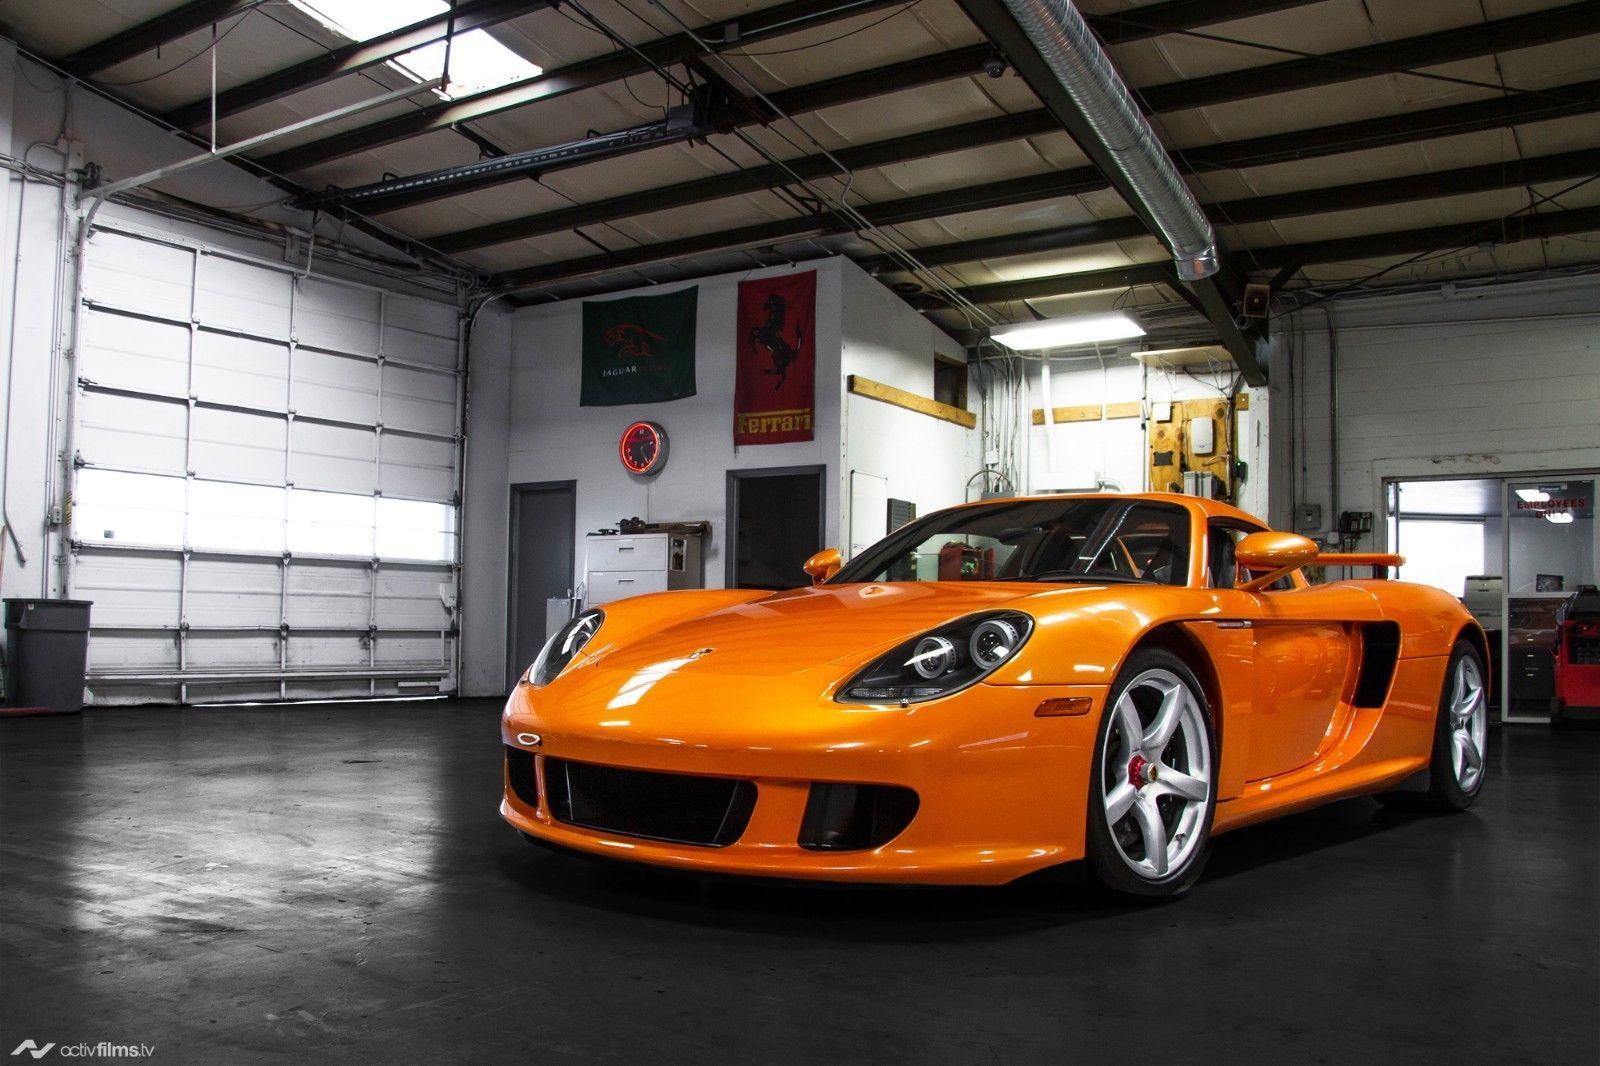 Porsche_Carrera_GT_Αrancio_Βorealis_0001